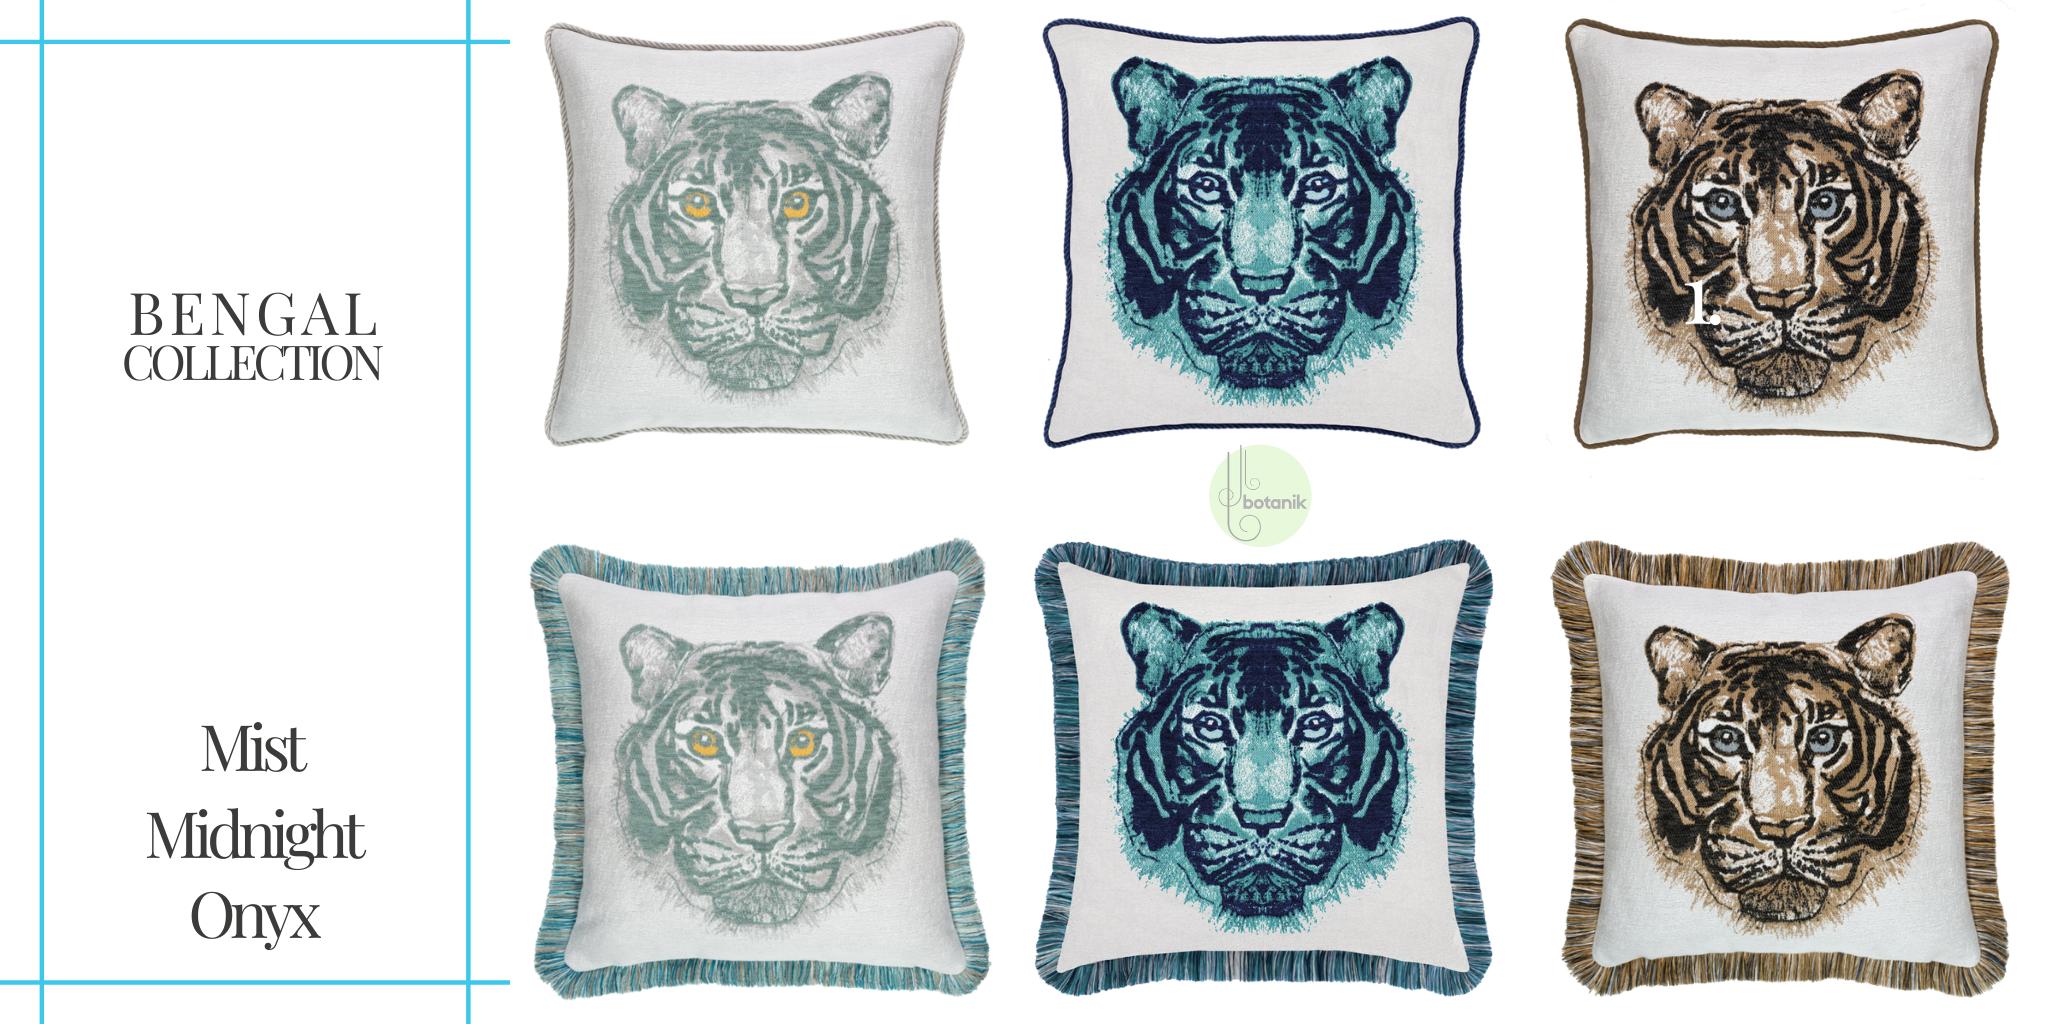 elaine-smith-bengal-collection-pillows